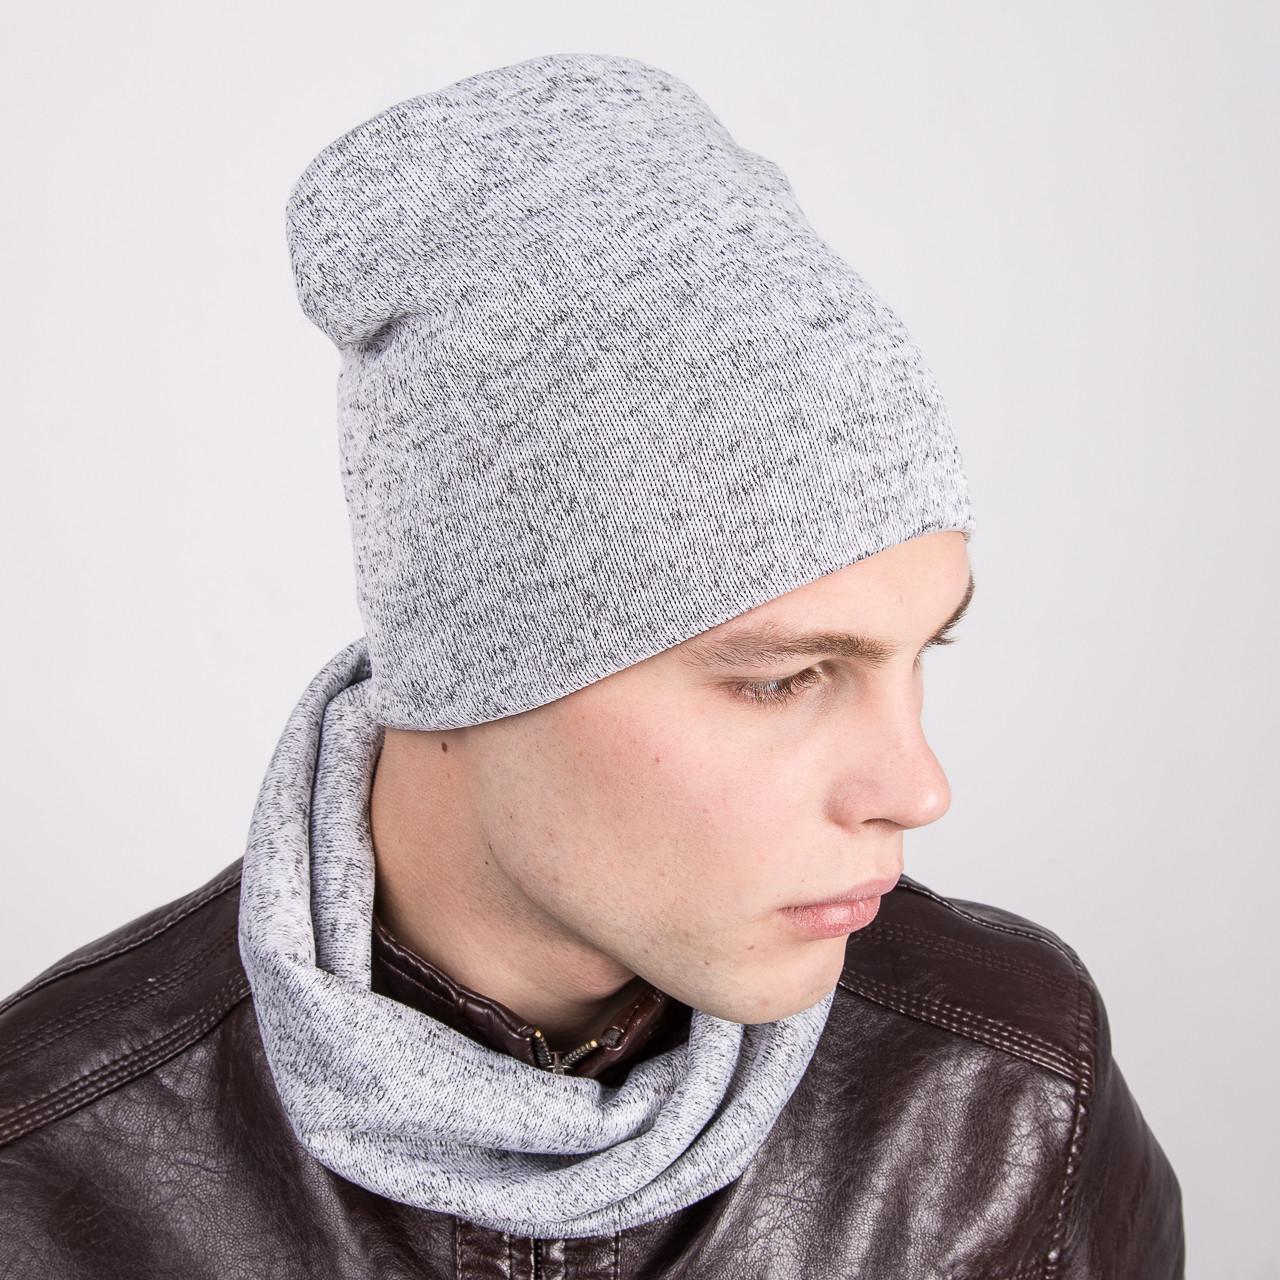 Зимний мужской комплект из шапки и хомута - Артикул k1c